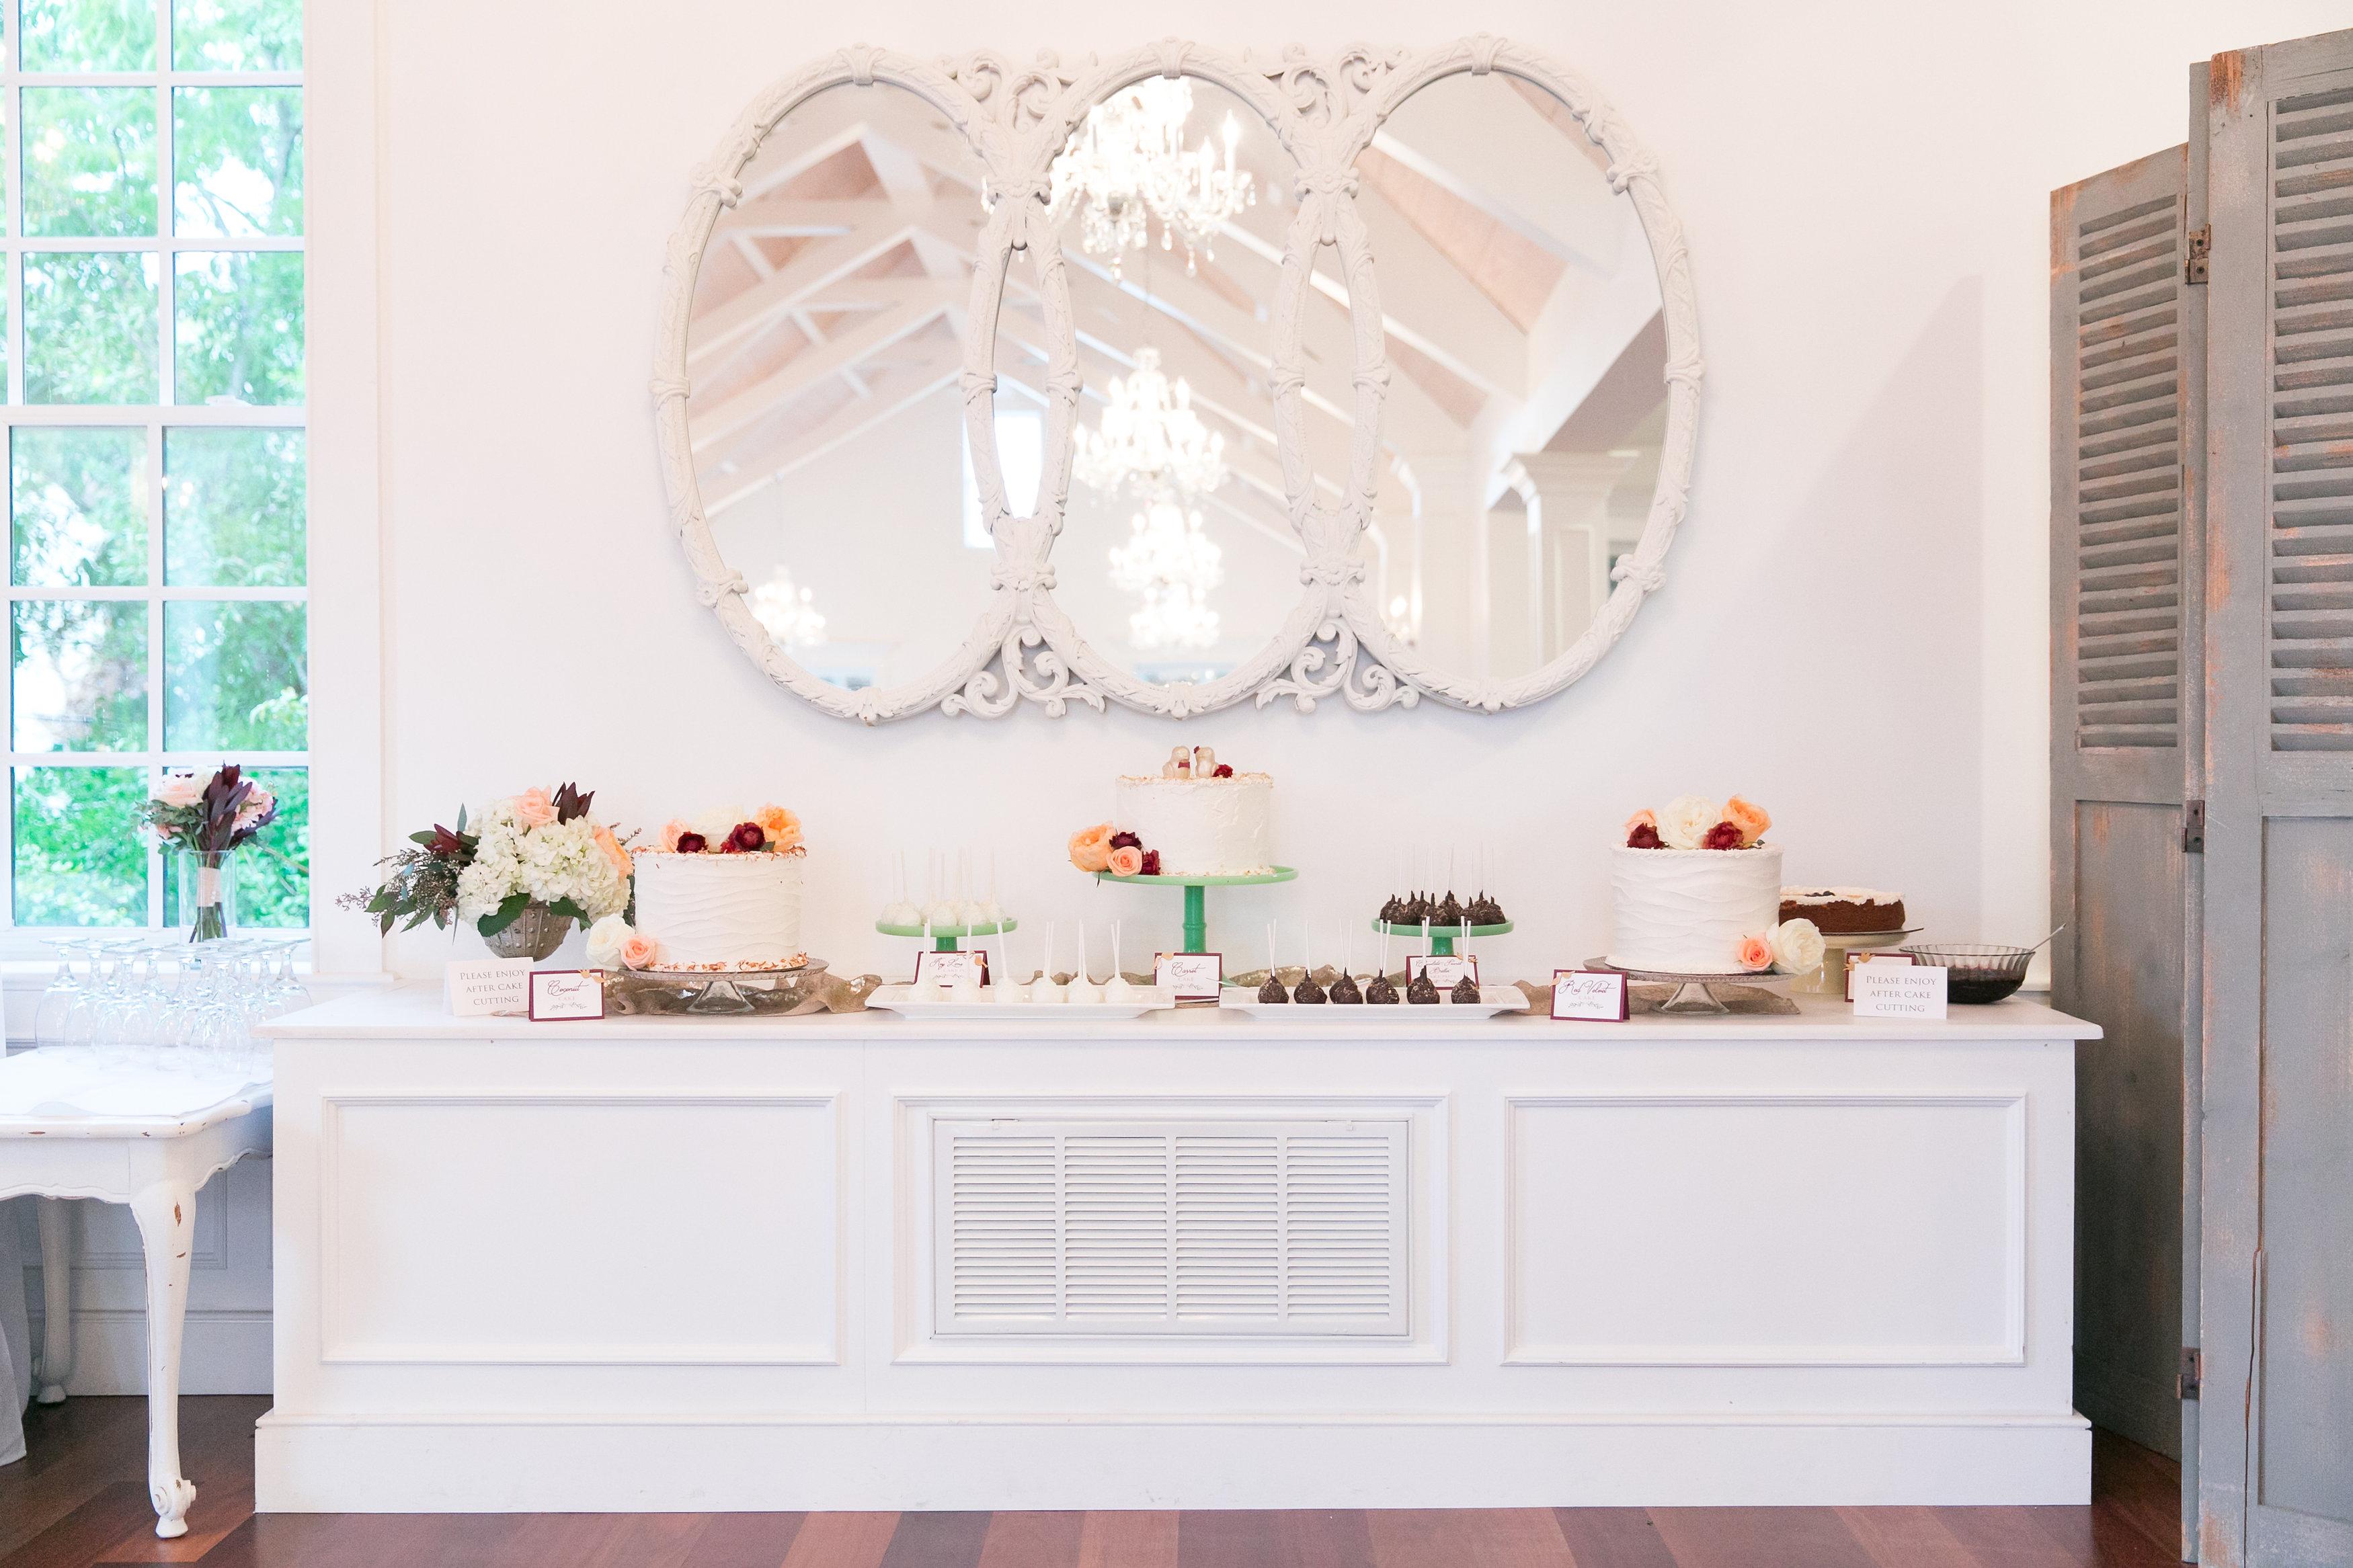 St-Augustine-Wedding-Villa-Blanca-White-Room-Cake-Display